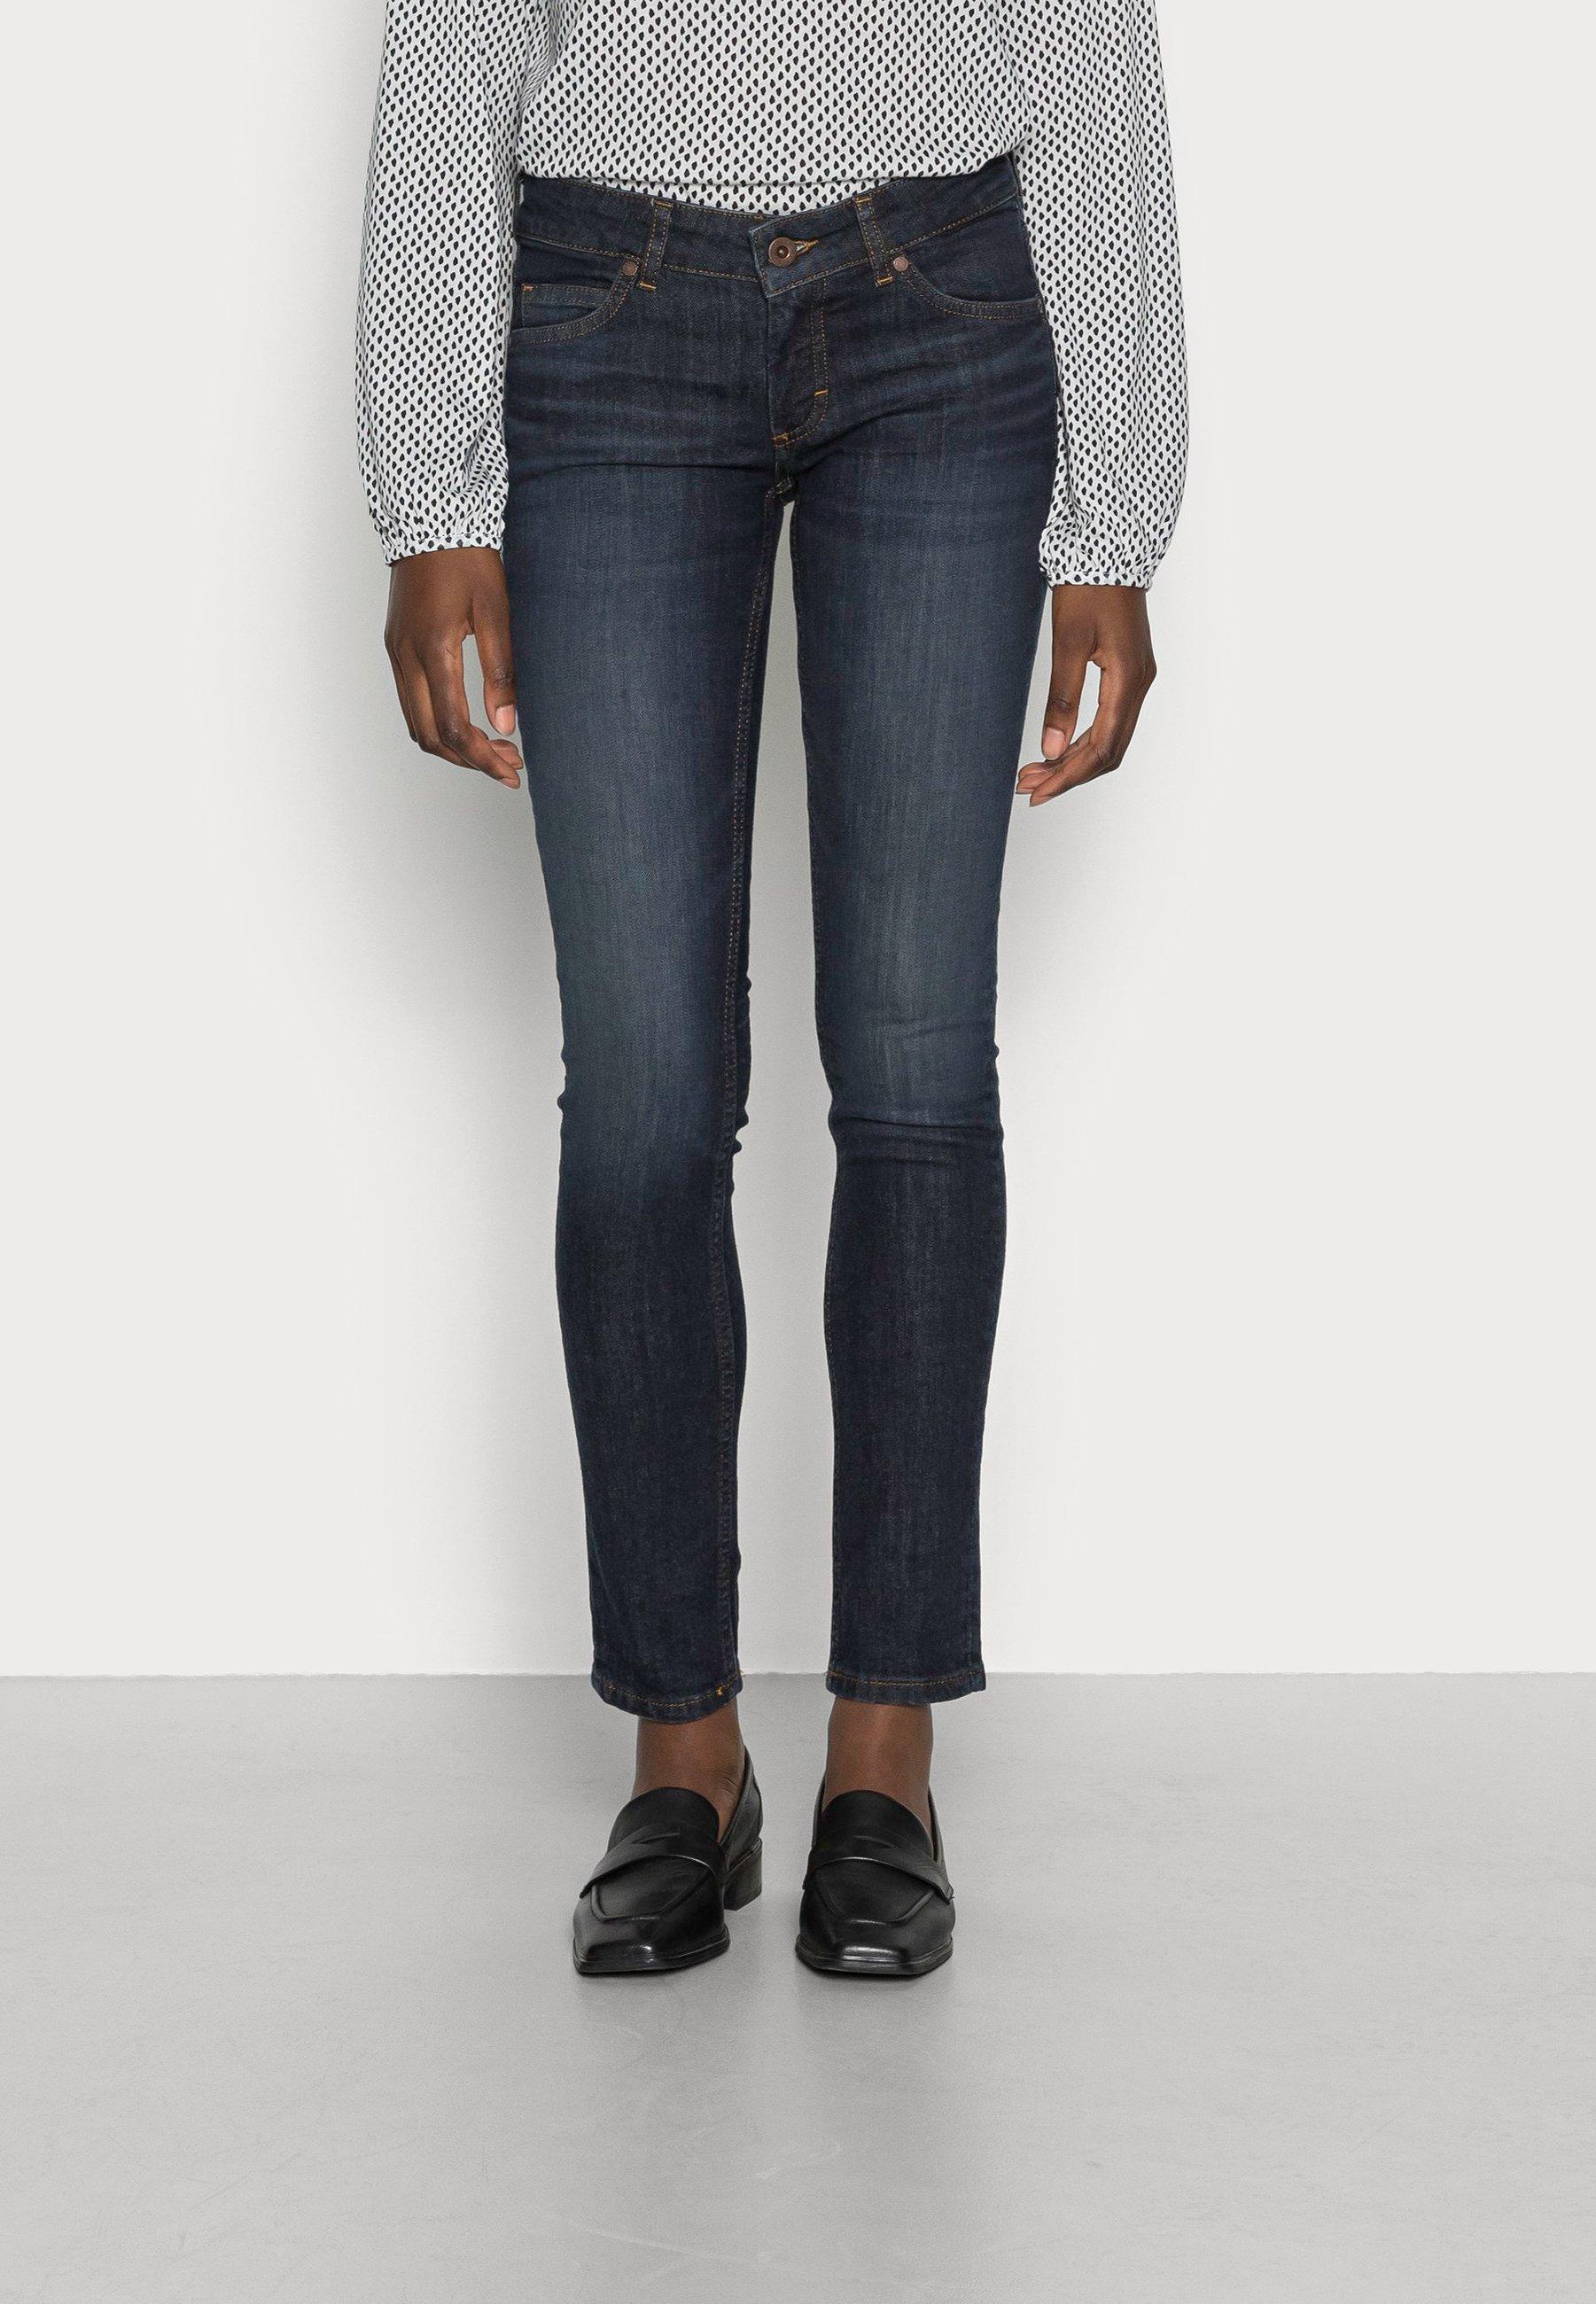 Women DENIM TROUSER LOW WAIST SKINNY FIT REGULAR LENGTH - Jeans Skinny Fit